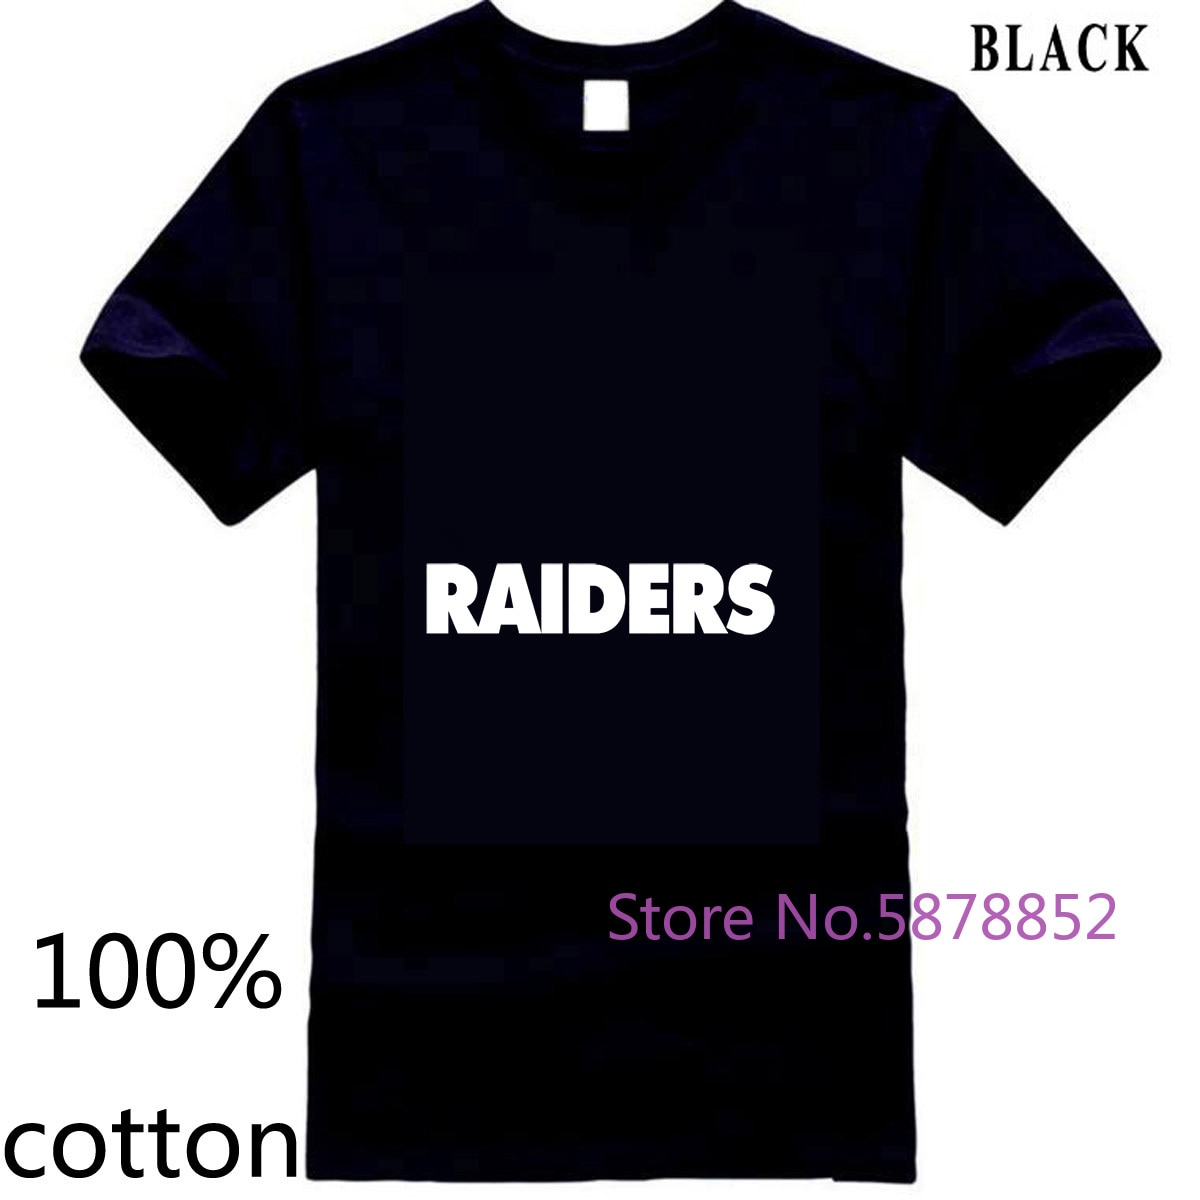 Camiseta RAIDERBlack de fútbol Oakland Bay AFC Carr Champs All s estilo chino para hombre, camisetas, camisetas, 100% de algodón para hombre